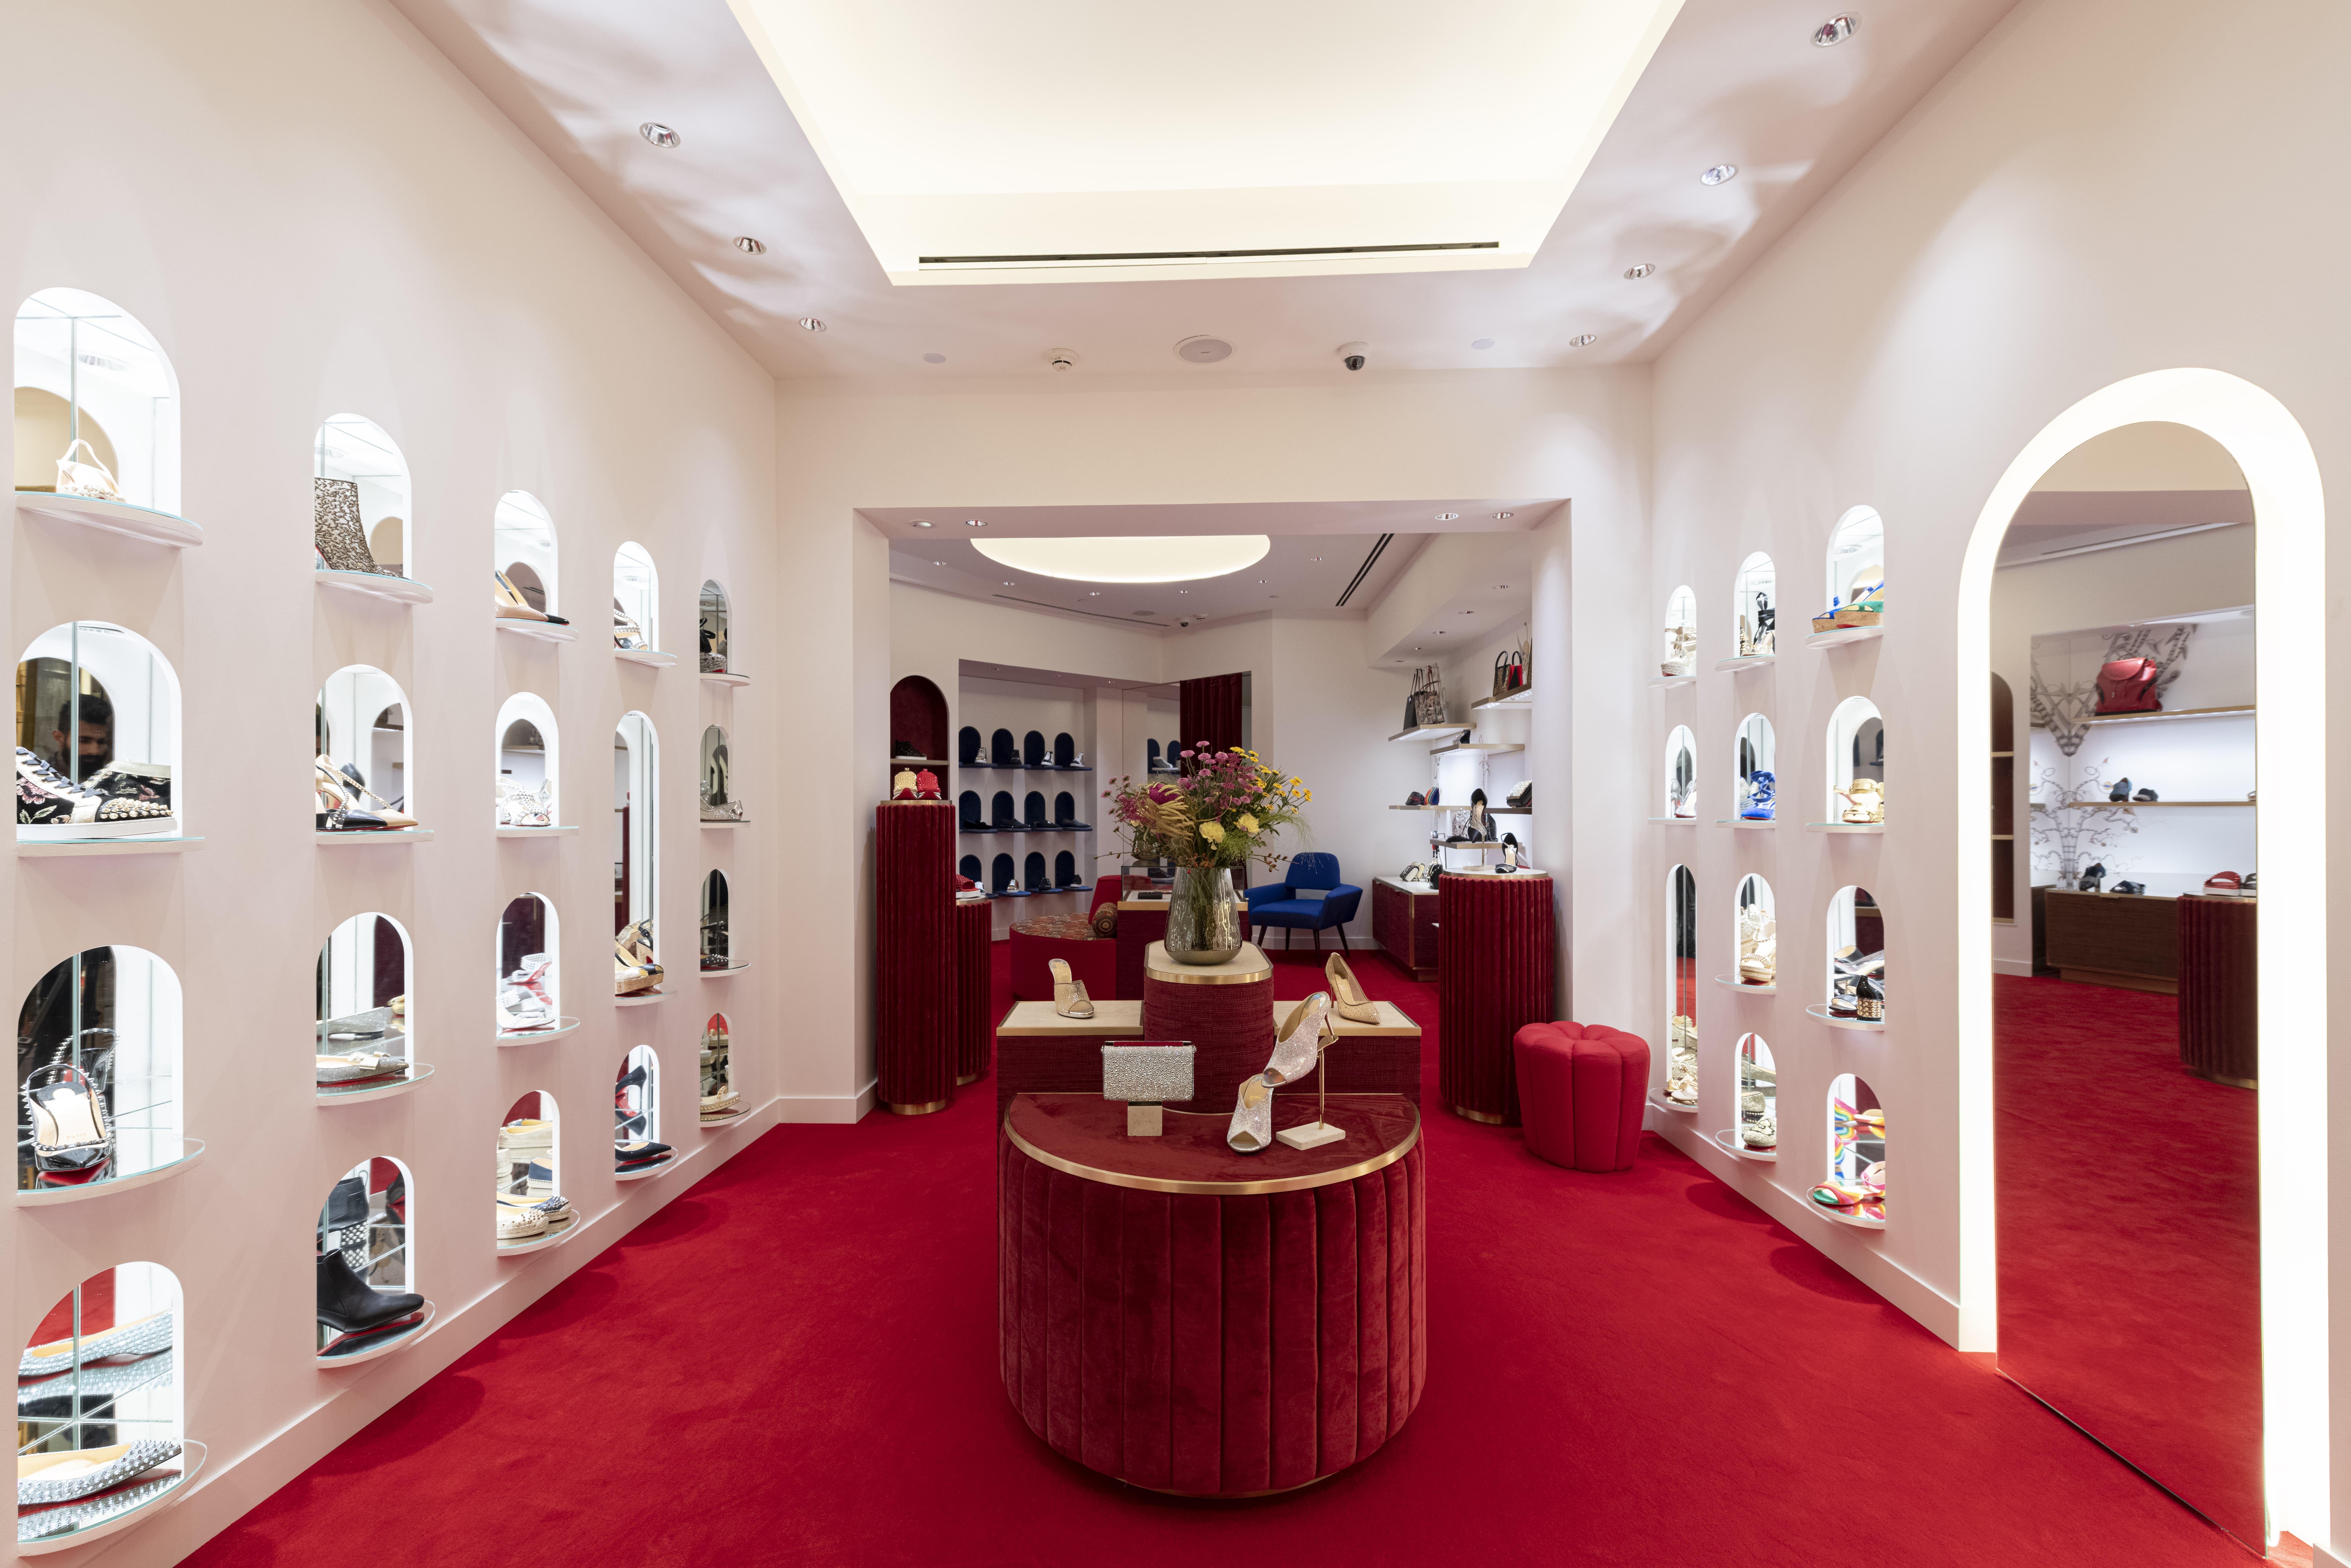 Christian Louboutin - New Delhi Boutique